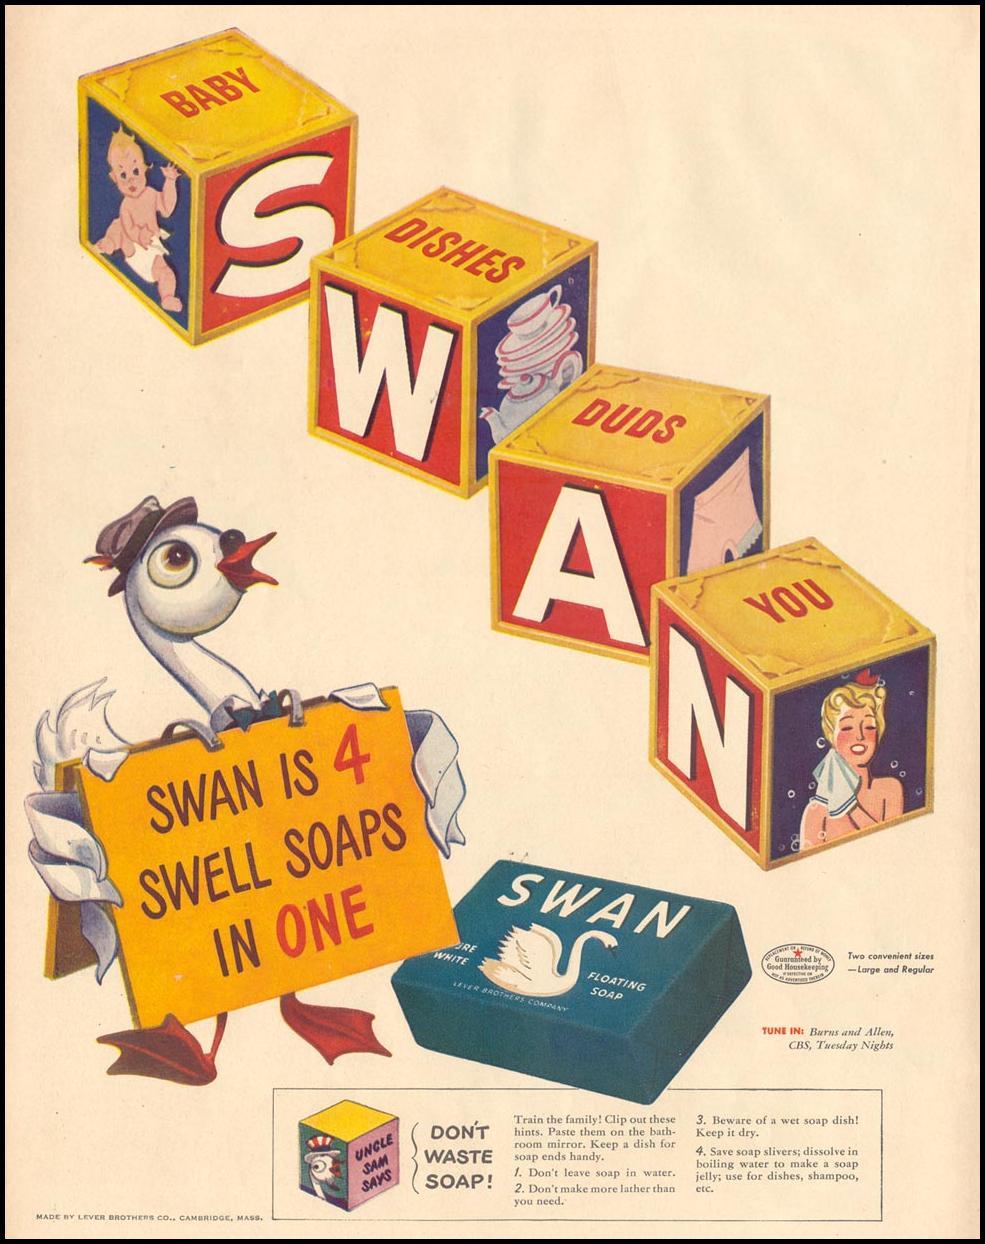 SWAN SOAP LIFE 11/08/1943